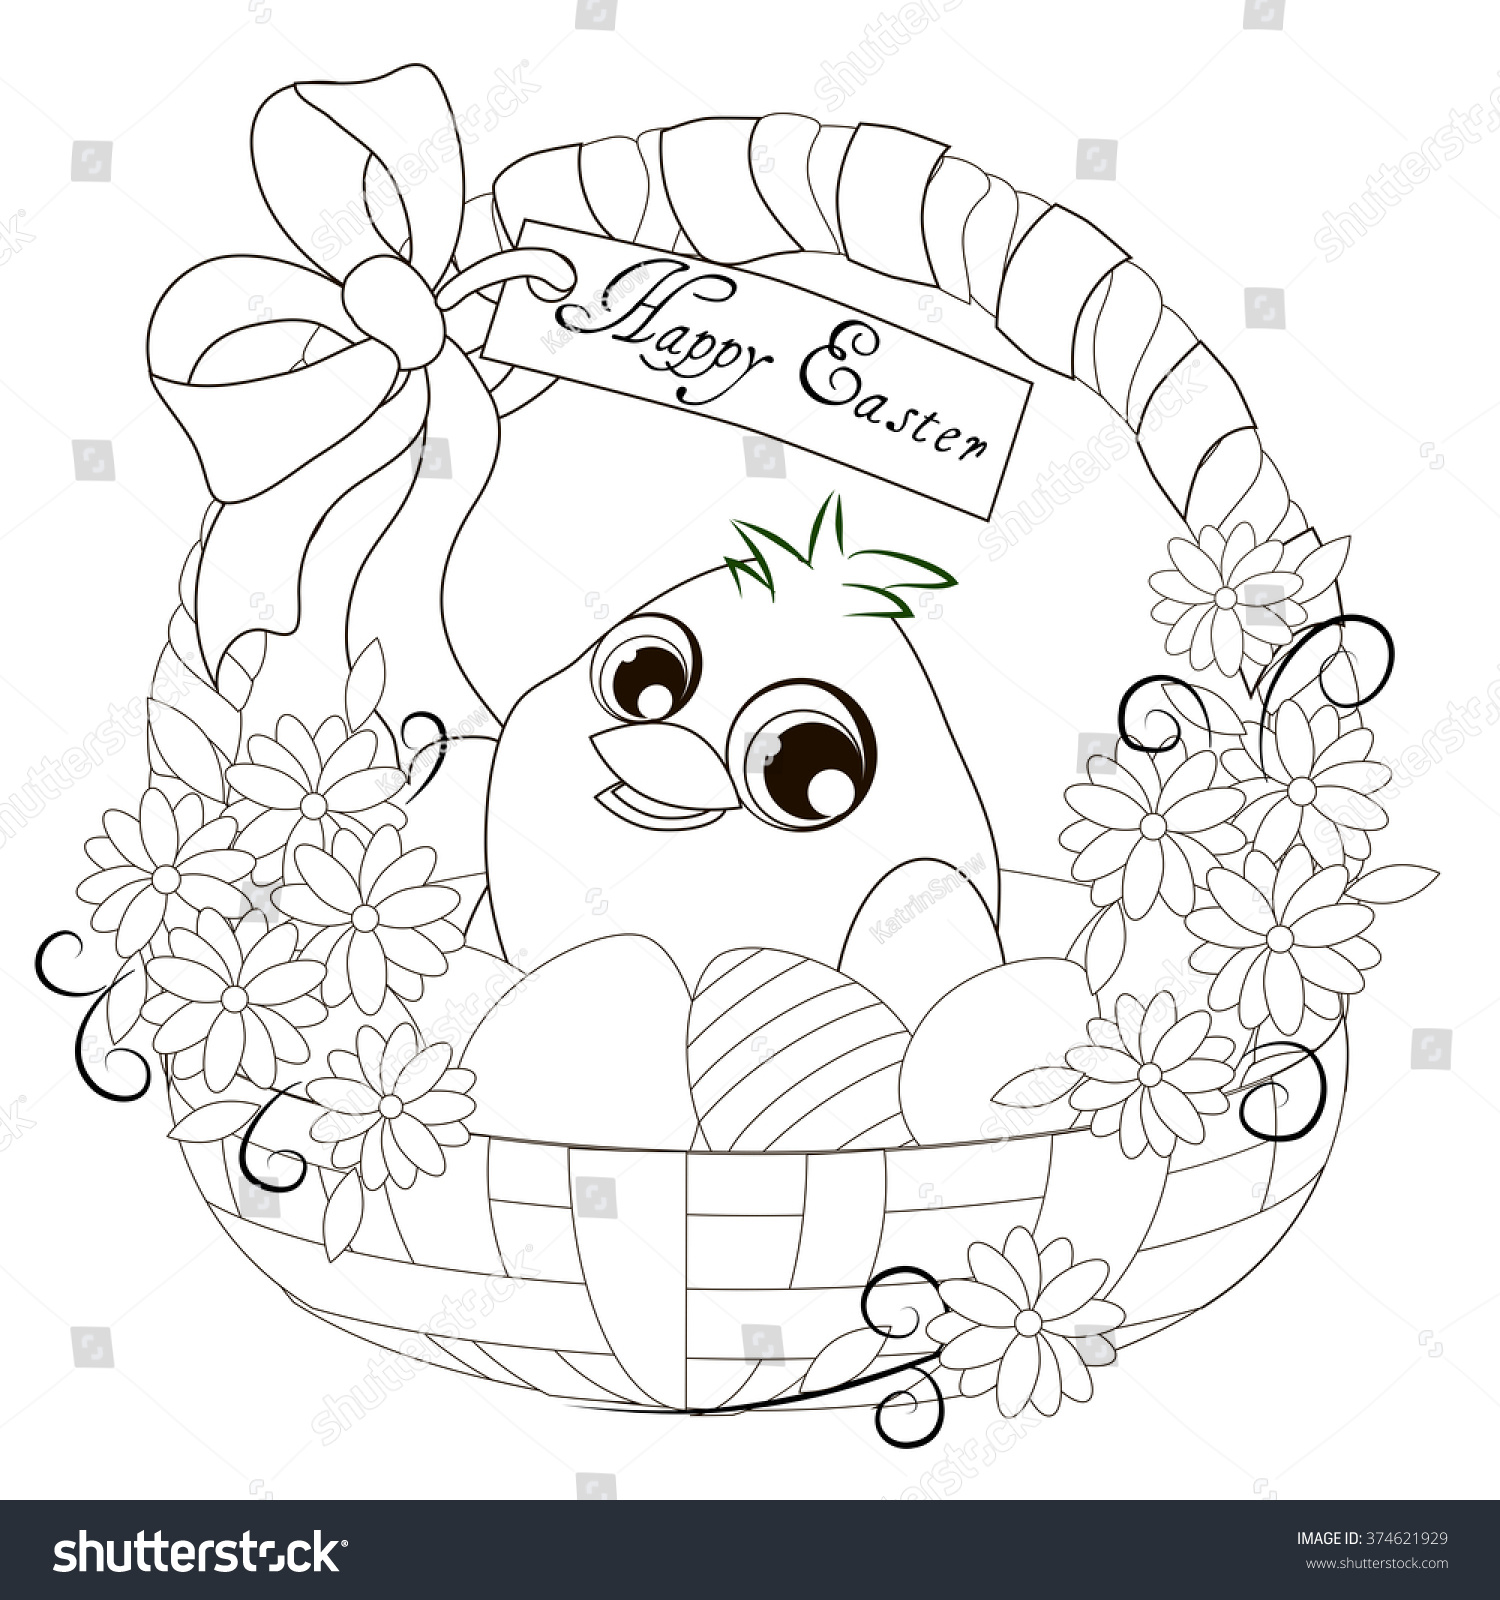 Easter Basket Chick Easter Basket Chick Stock Vector (Royalty Free ...